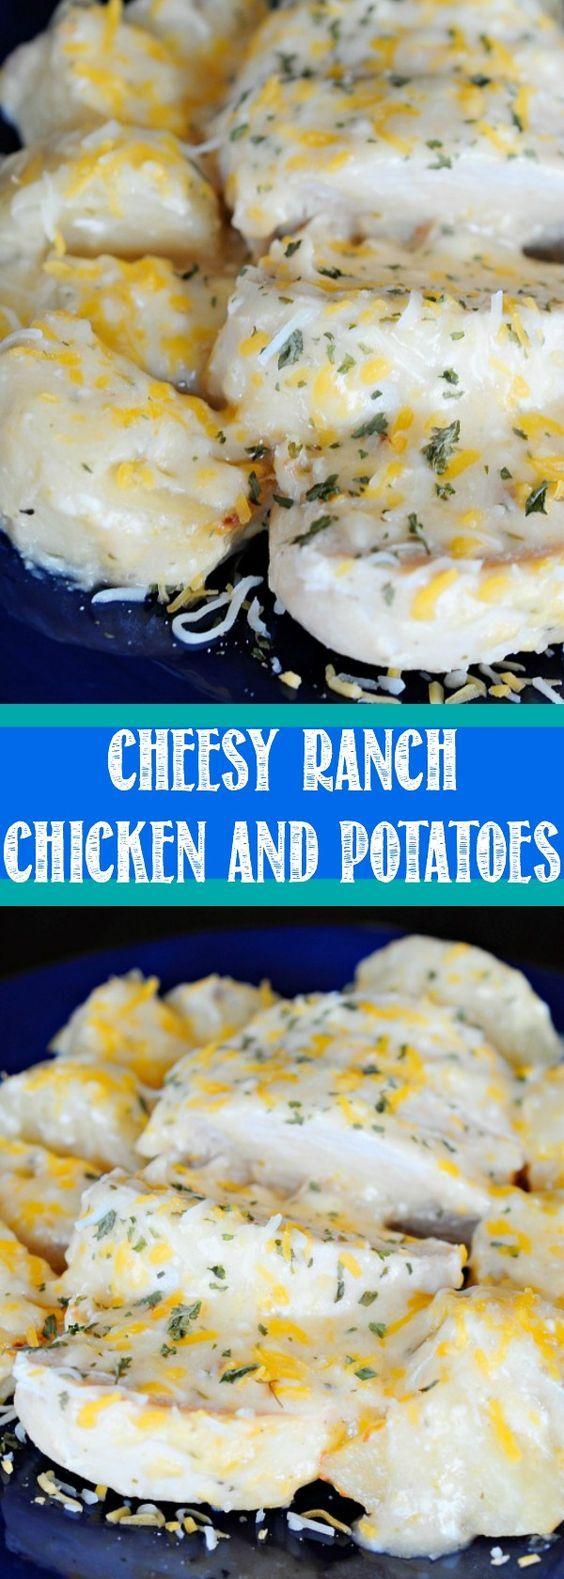 Cheesy Ranch Chicken and Potatoes | Recipe